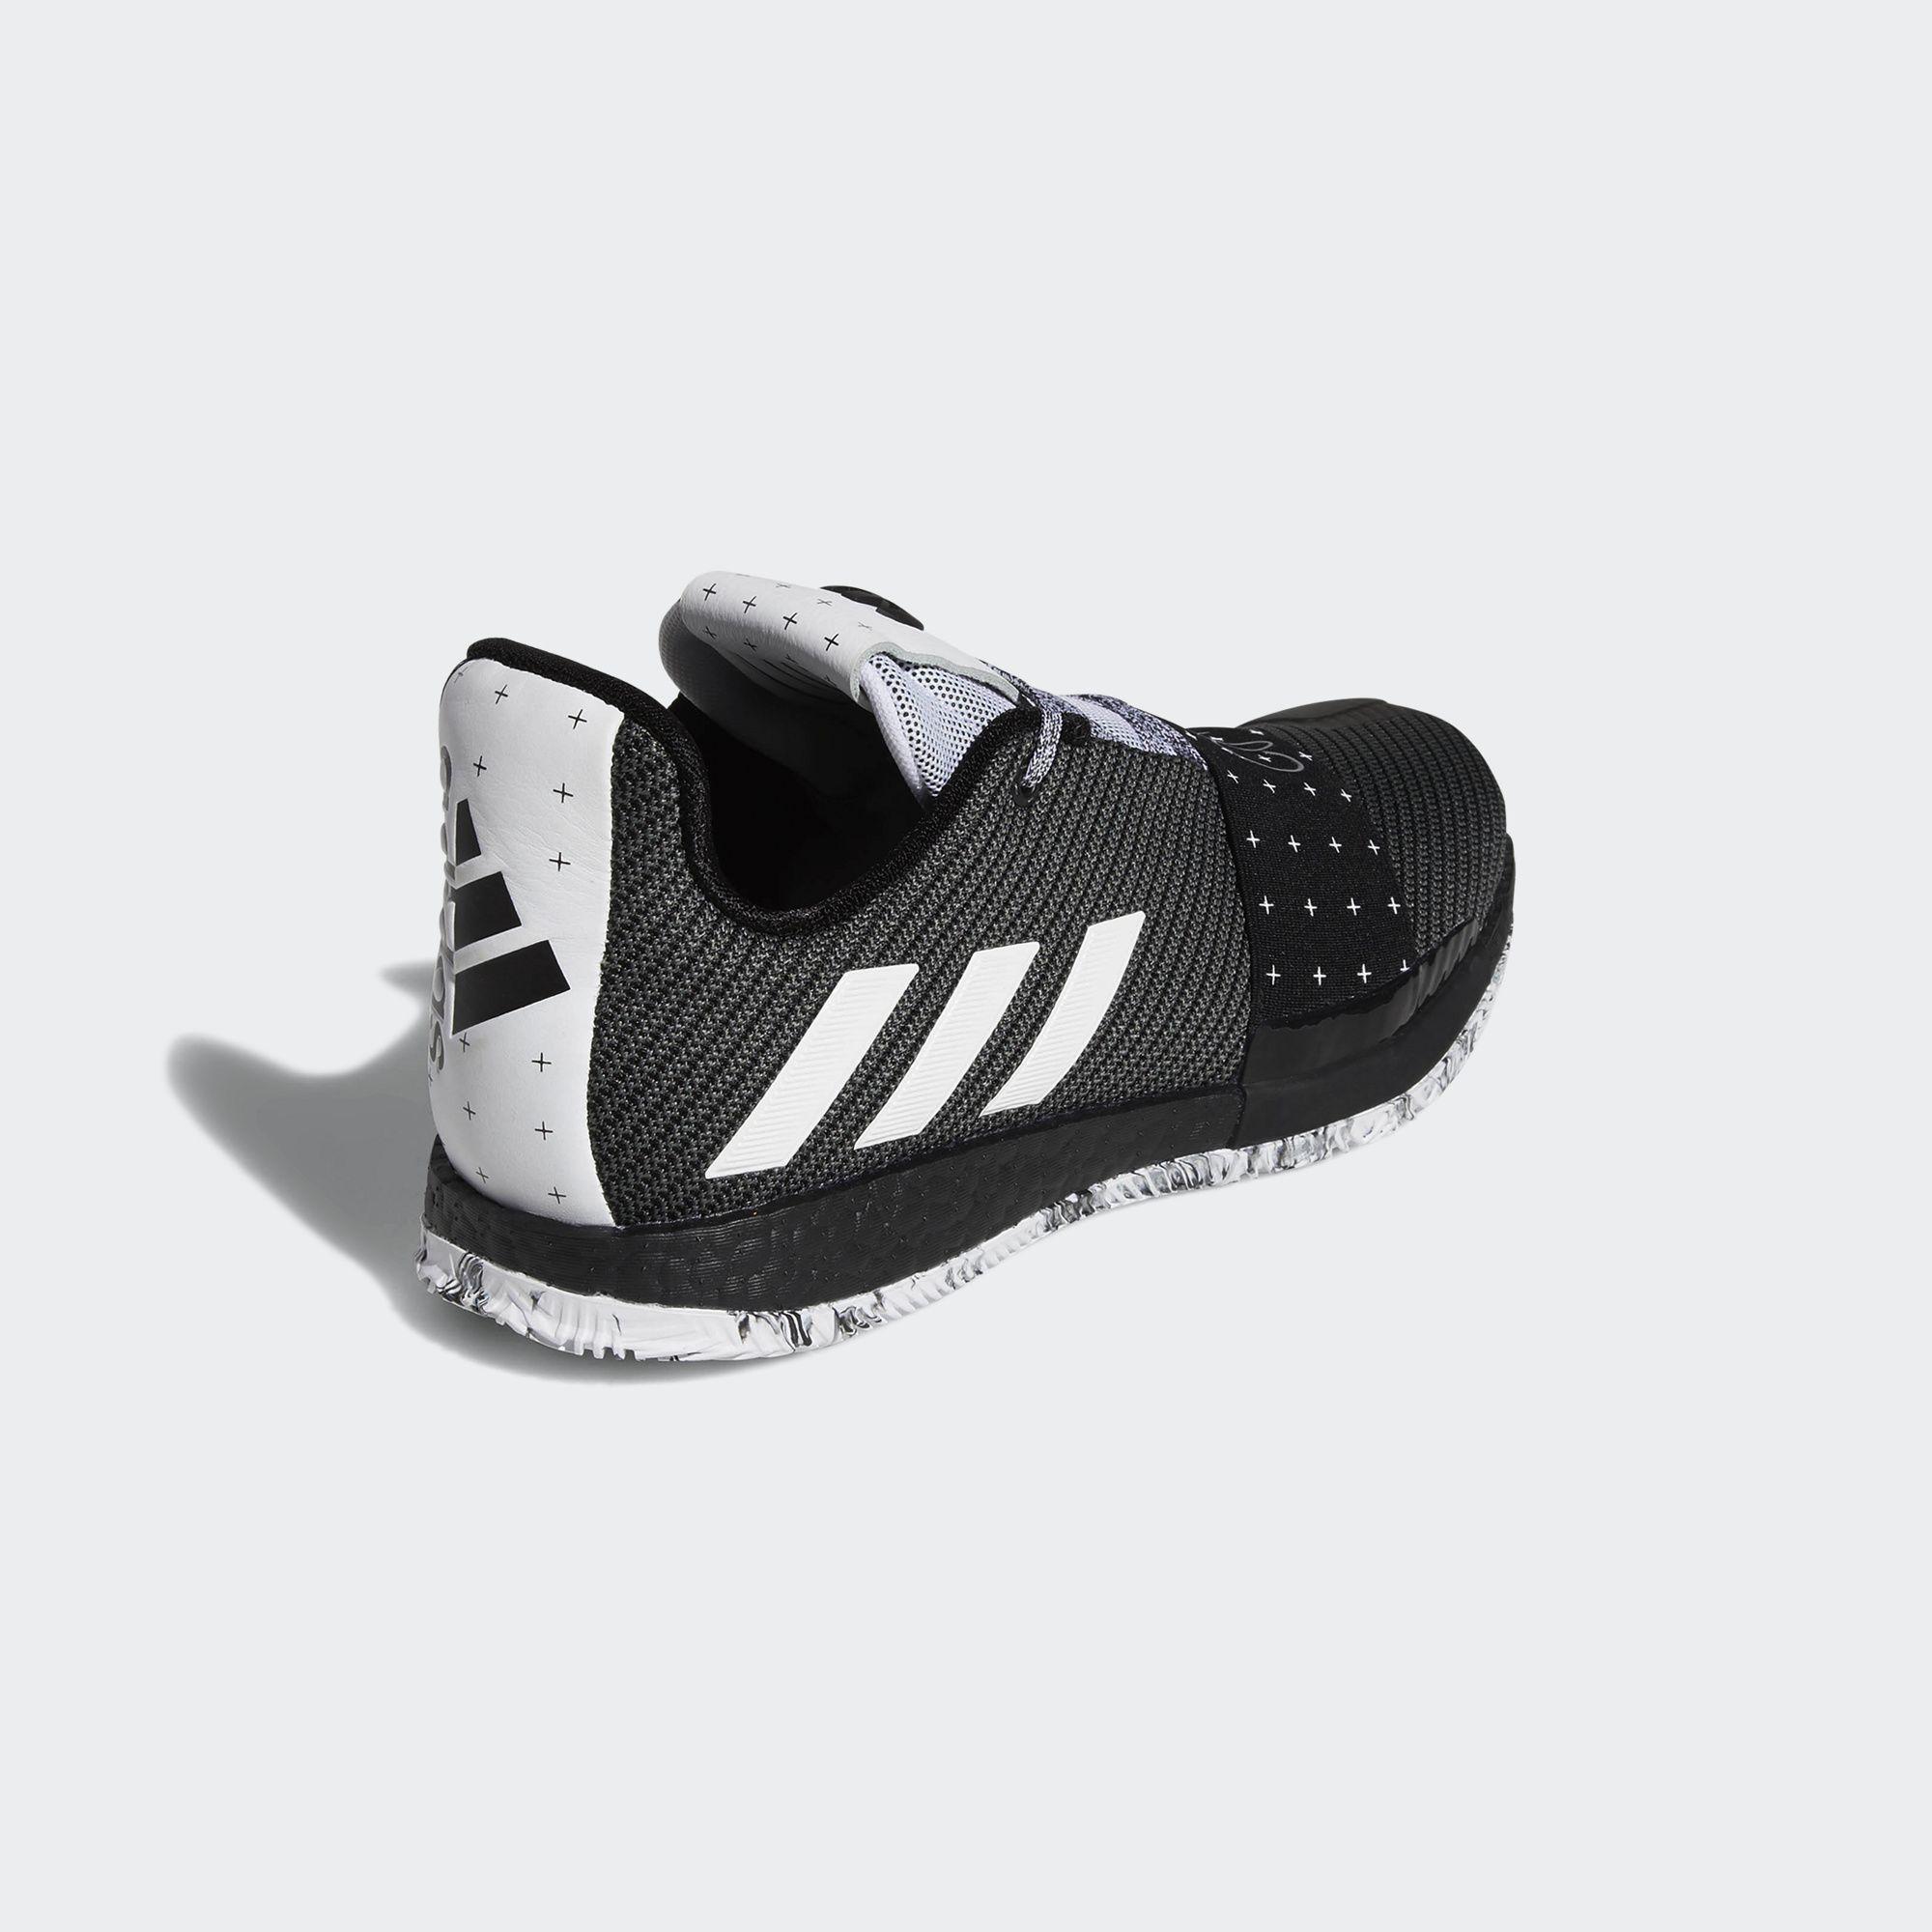 adidas harden vol 3 release date 5